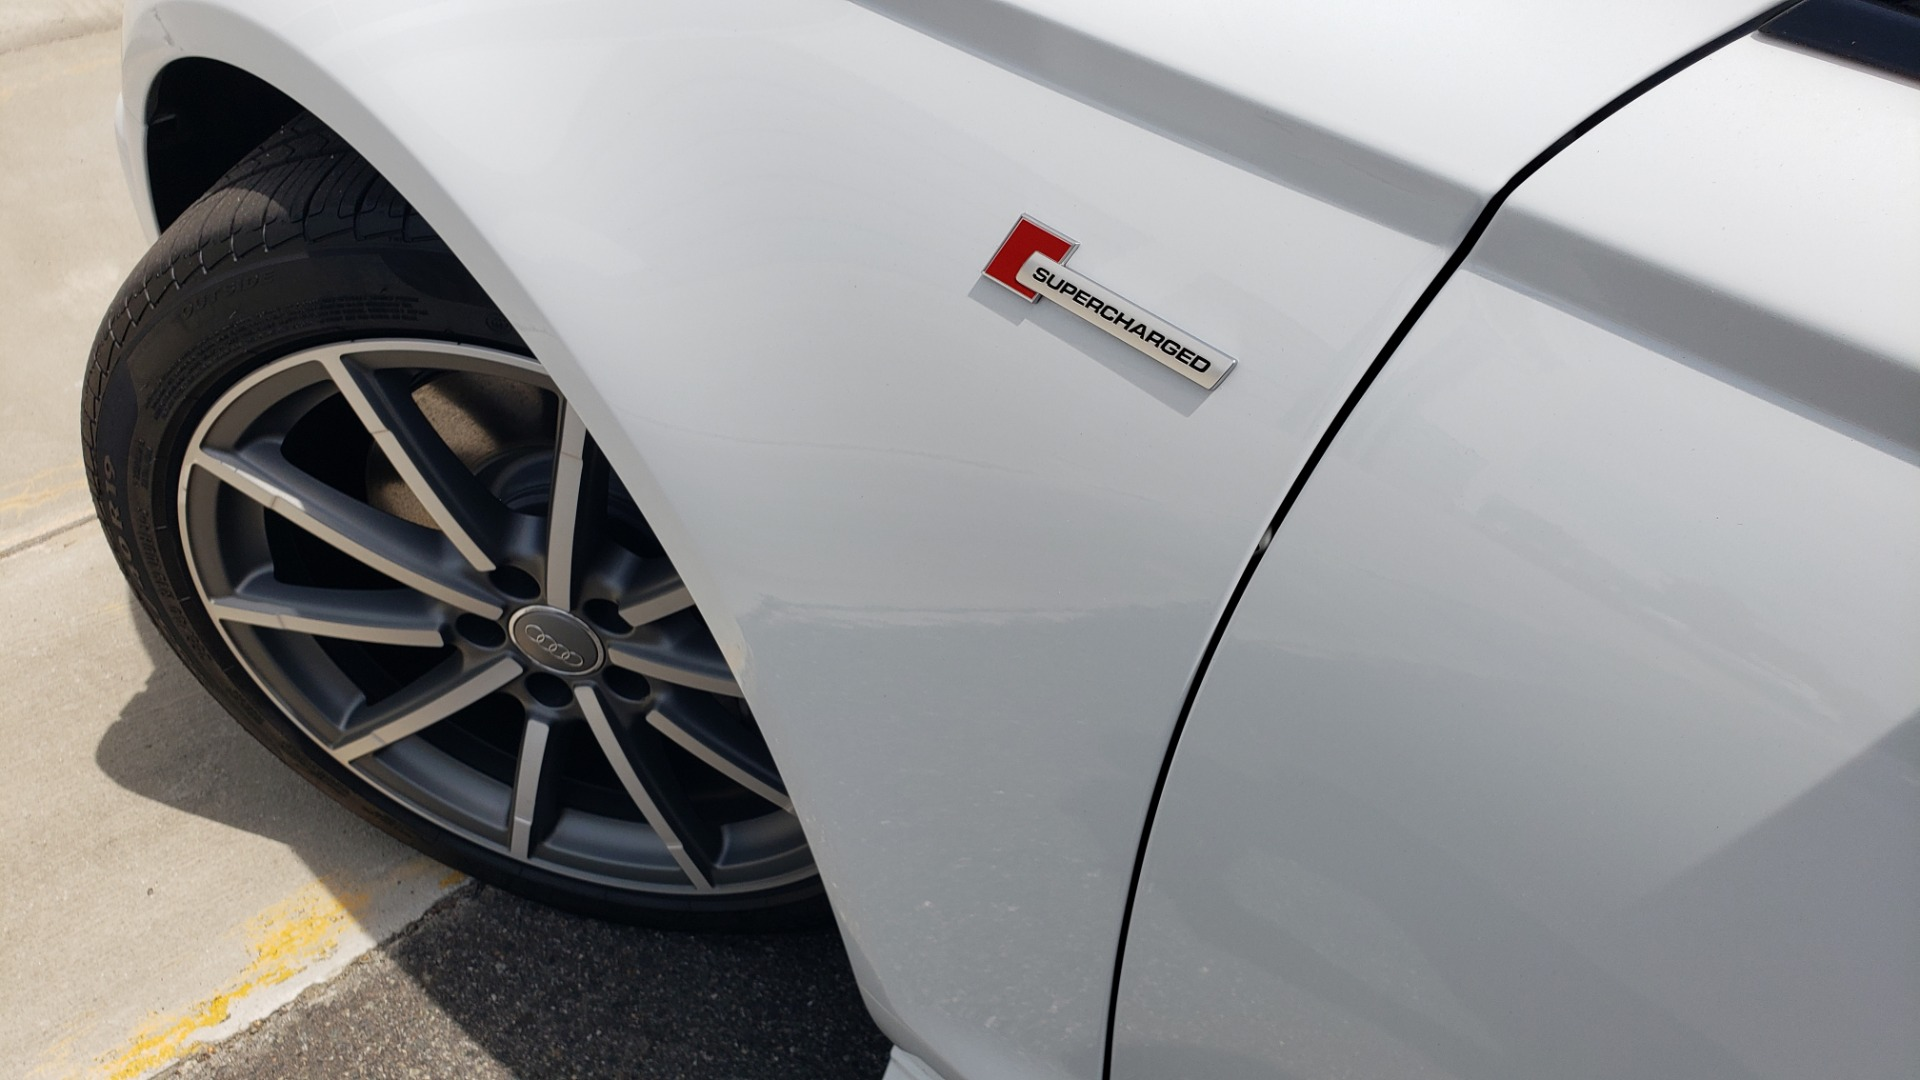 Used 2017 Audi A6 PRESTIGE SEDAN 3.0T / NAV / SUNROOF / BLACK OPTIC / CLD WTHR / REARVIEW for sale $30,797 at Formula Imports in Charlotte NC 28227 86